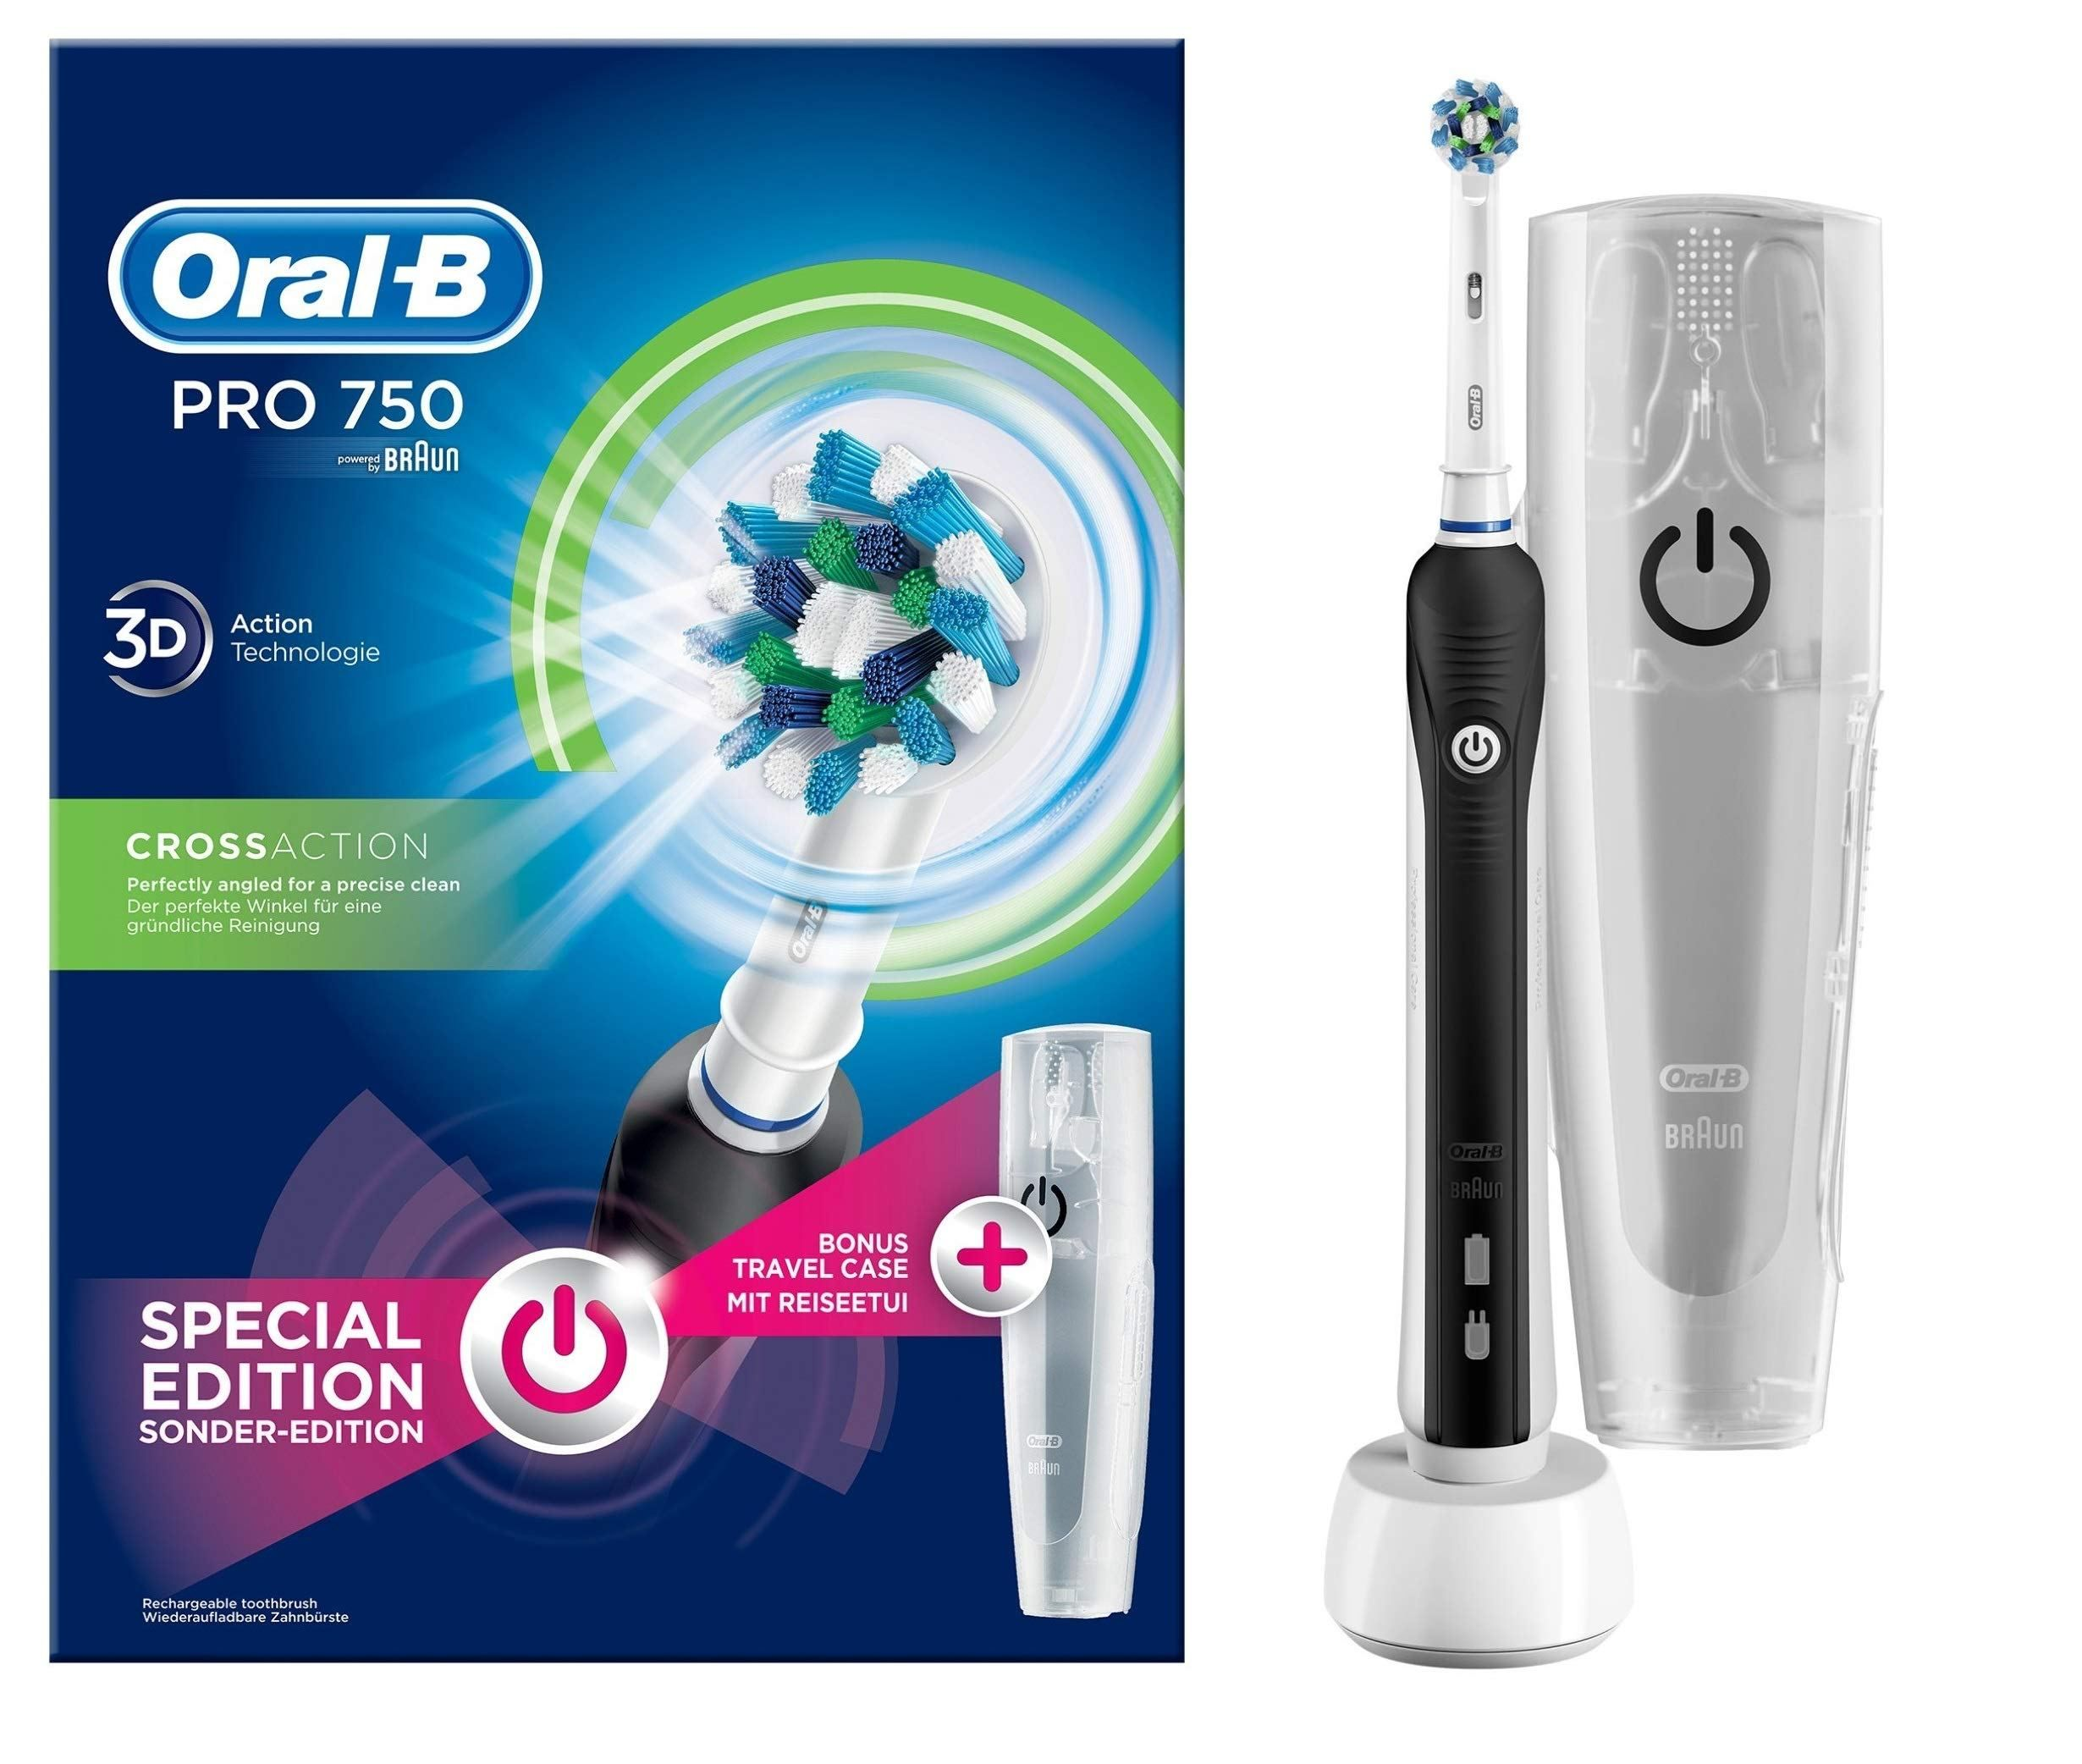 Oral B Pro 750 Crossaction Spazzolino Elettrico Ricaricabile Bonus Pack Il Movimento Dinamico Aiuta A Ottenere Oral B Rechargeable Toothbrush Brushing Teeth